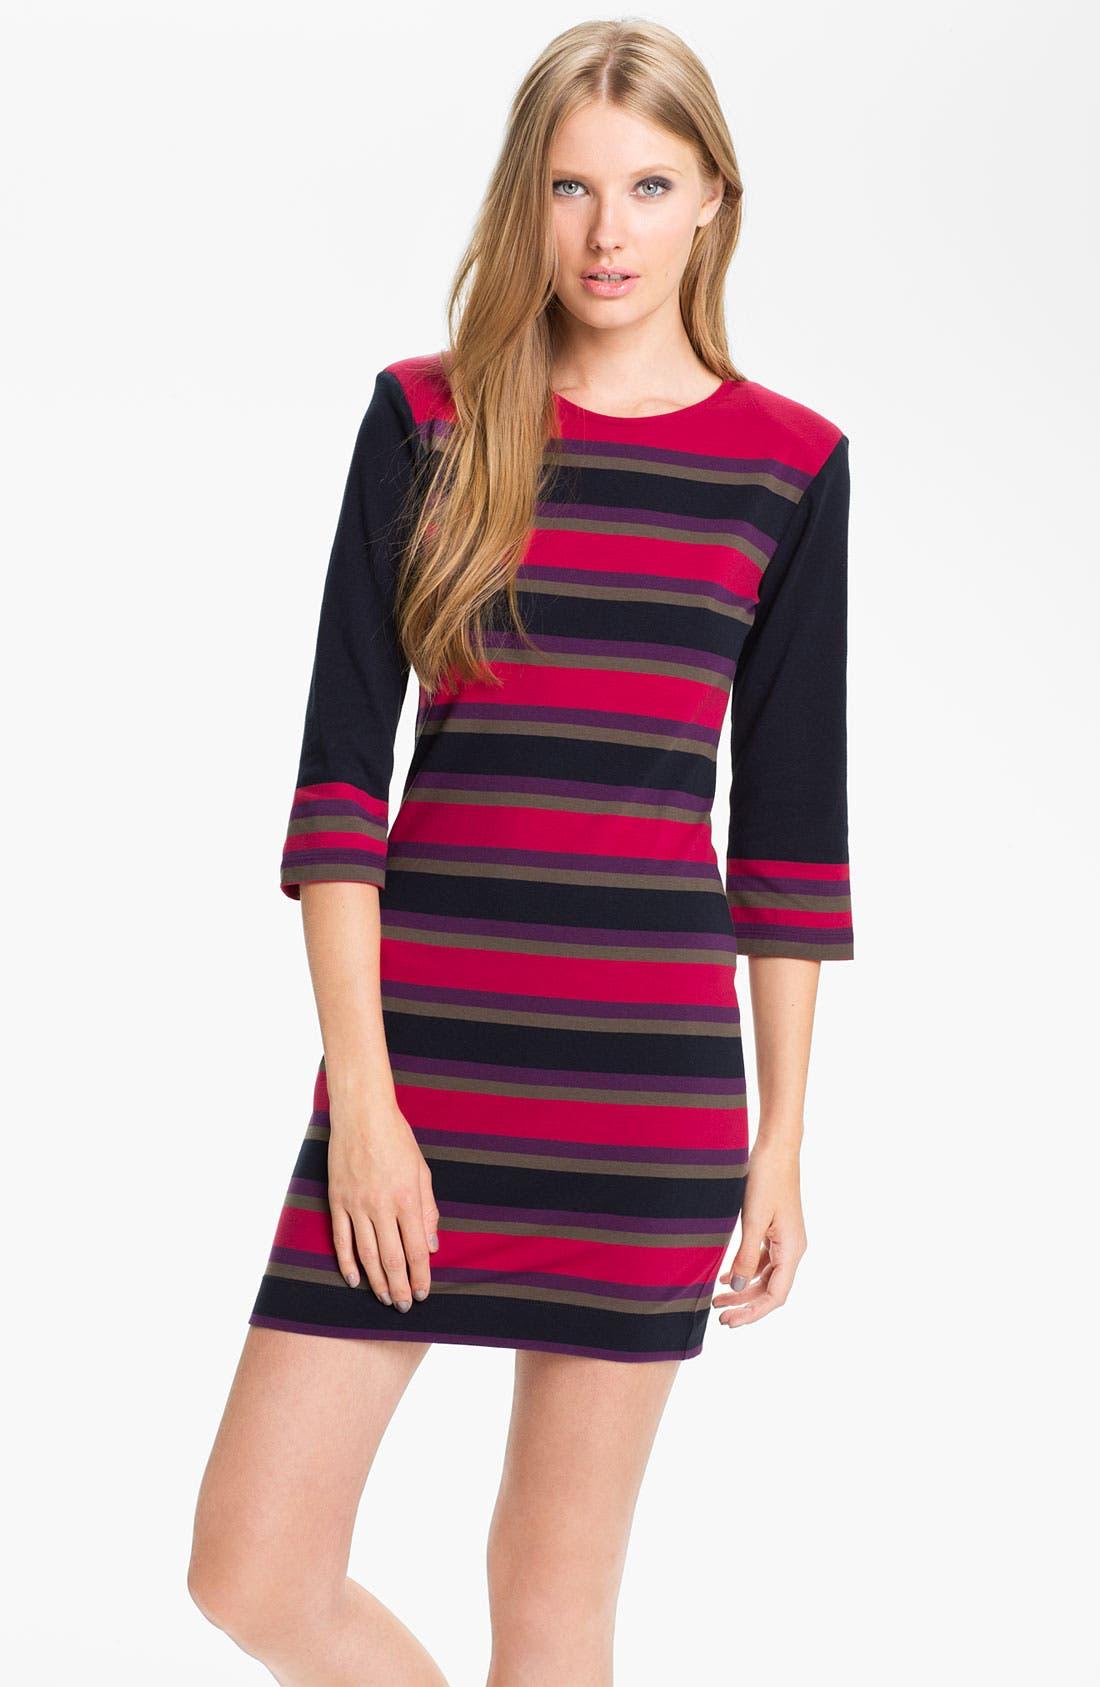 Alternate Image 1 Selected - French Connection 'Koni' Stripe Knit Sheath Dress